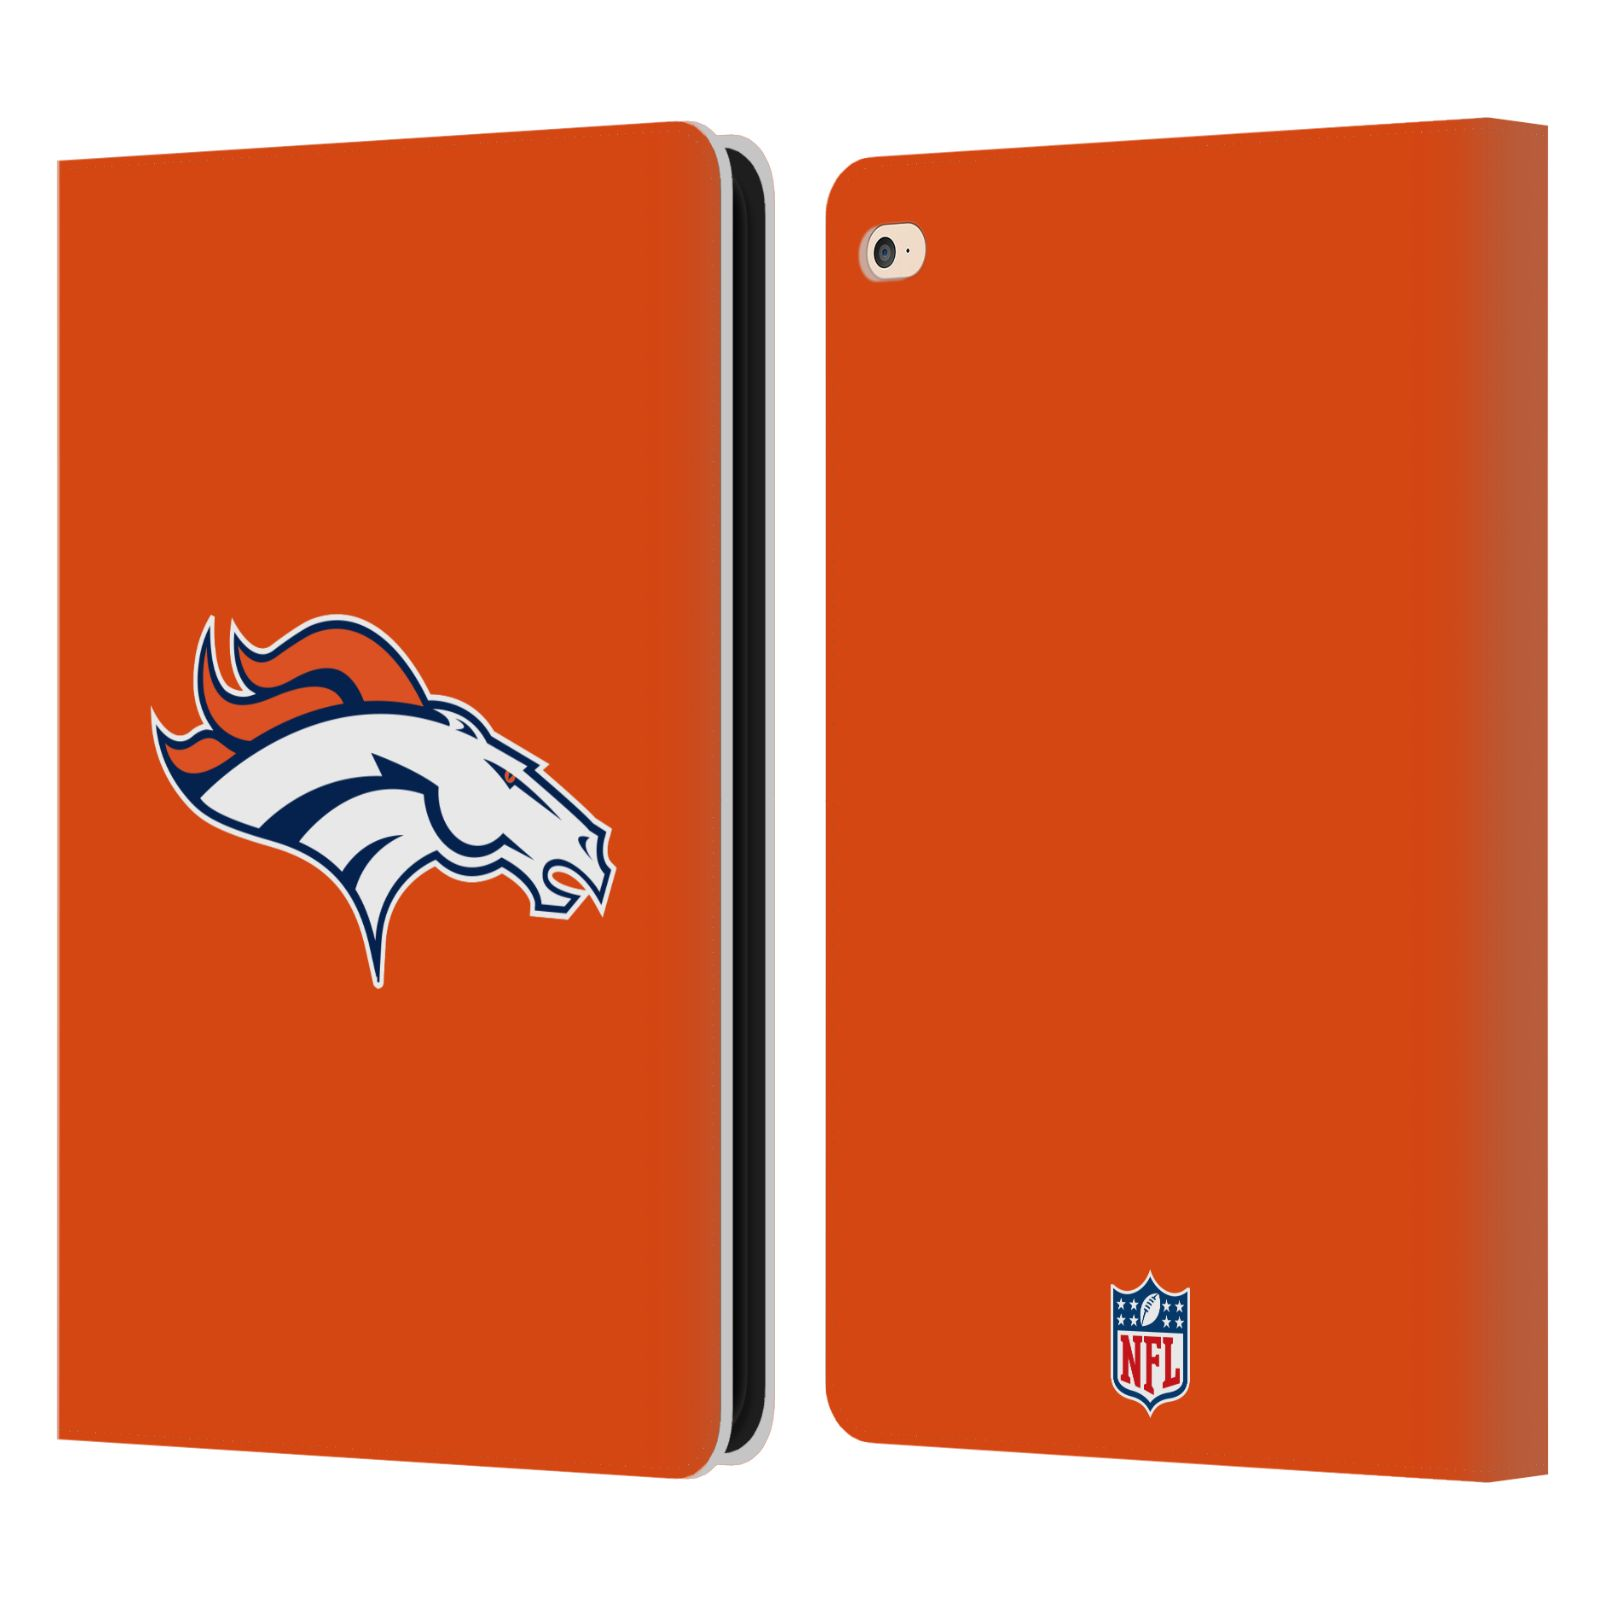 OFFICIAL-NFL-DENVER-BRONCOS-LOGO-LEATHER-BOOK-WALLET-CASE-COVER-FOR-APPLE-iPAD